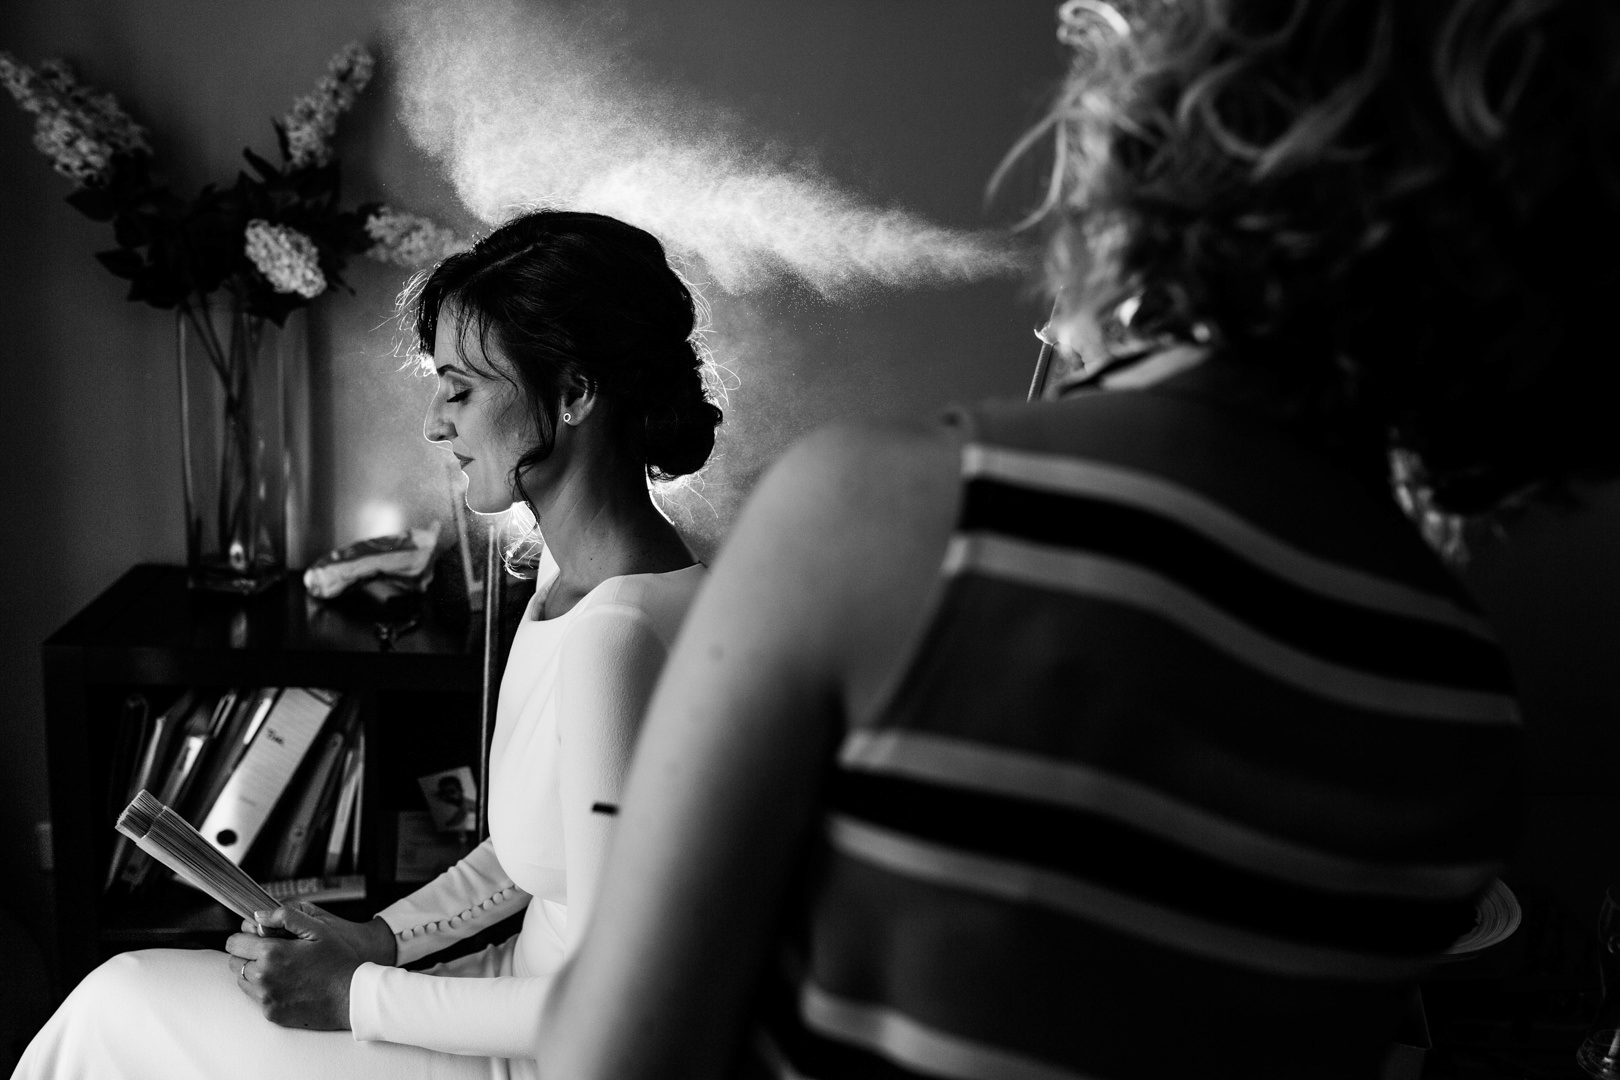 Boda-Irene-Marcos-Dos-Hermanas-Finca-Clotidle-engagement-Rafael-Torres-fotografo-bodas-sevilla-madrid-barcelona-wedding-photographer--12.jpg